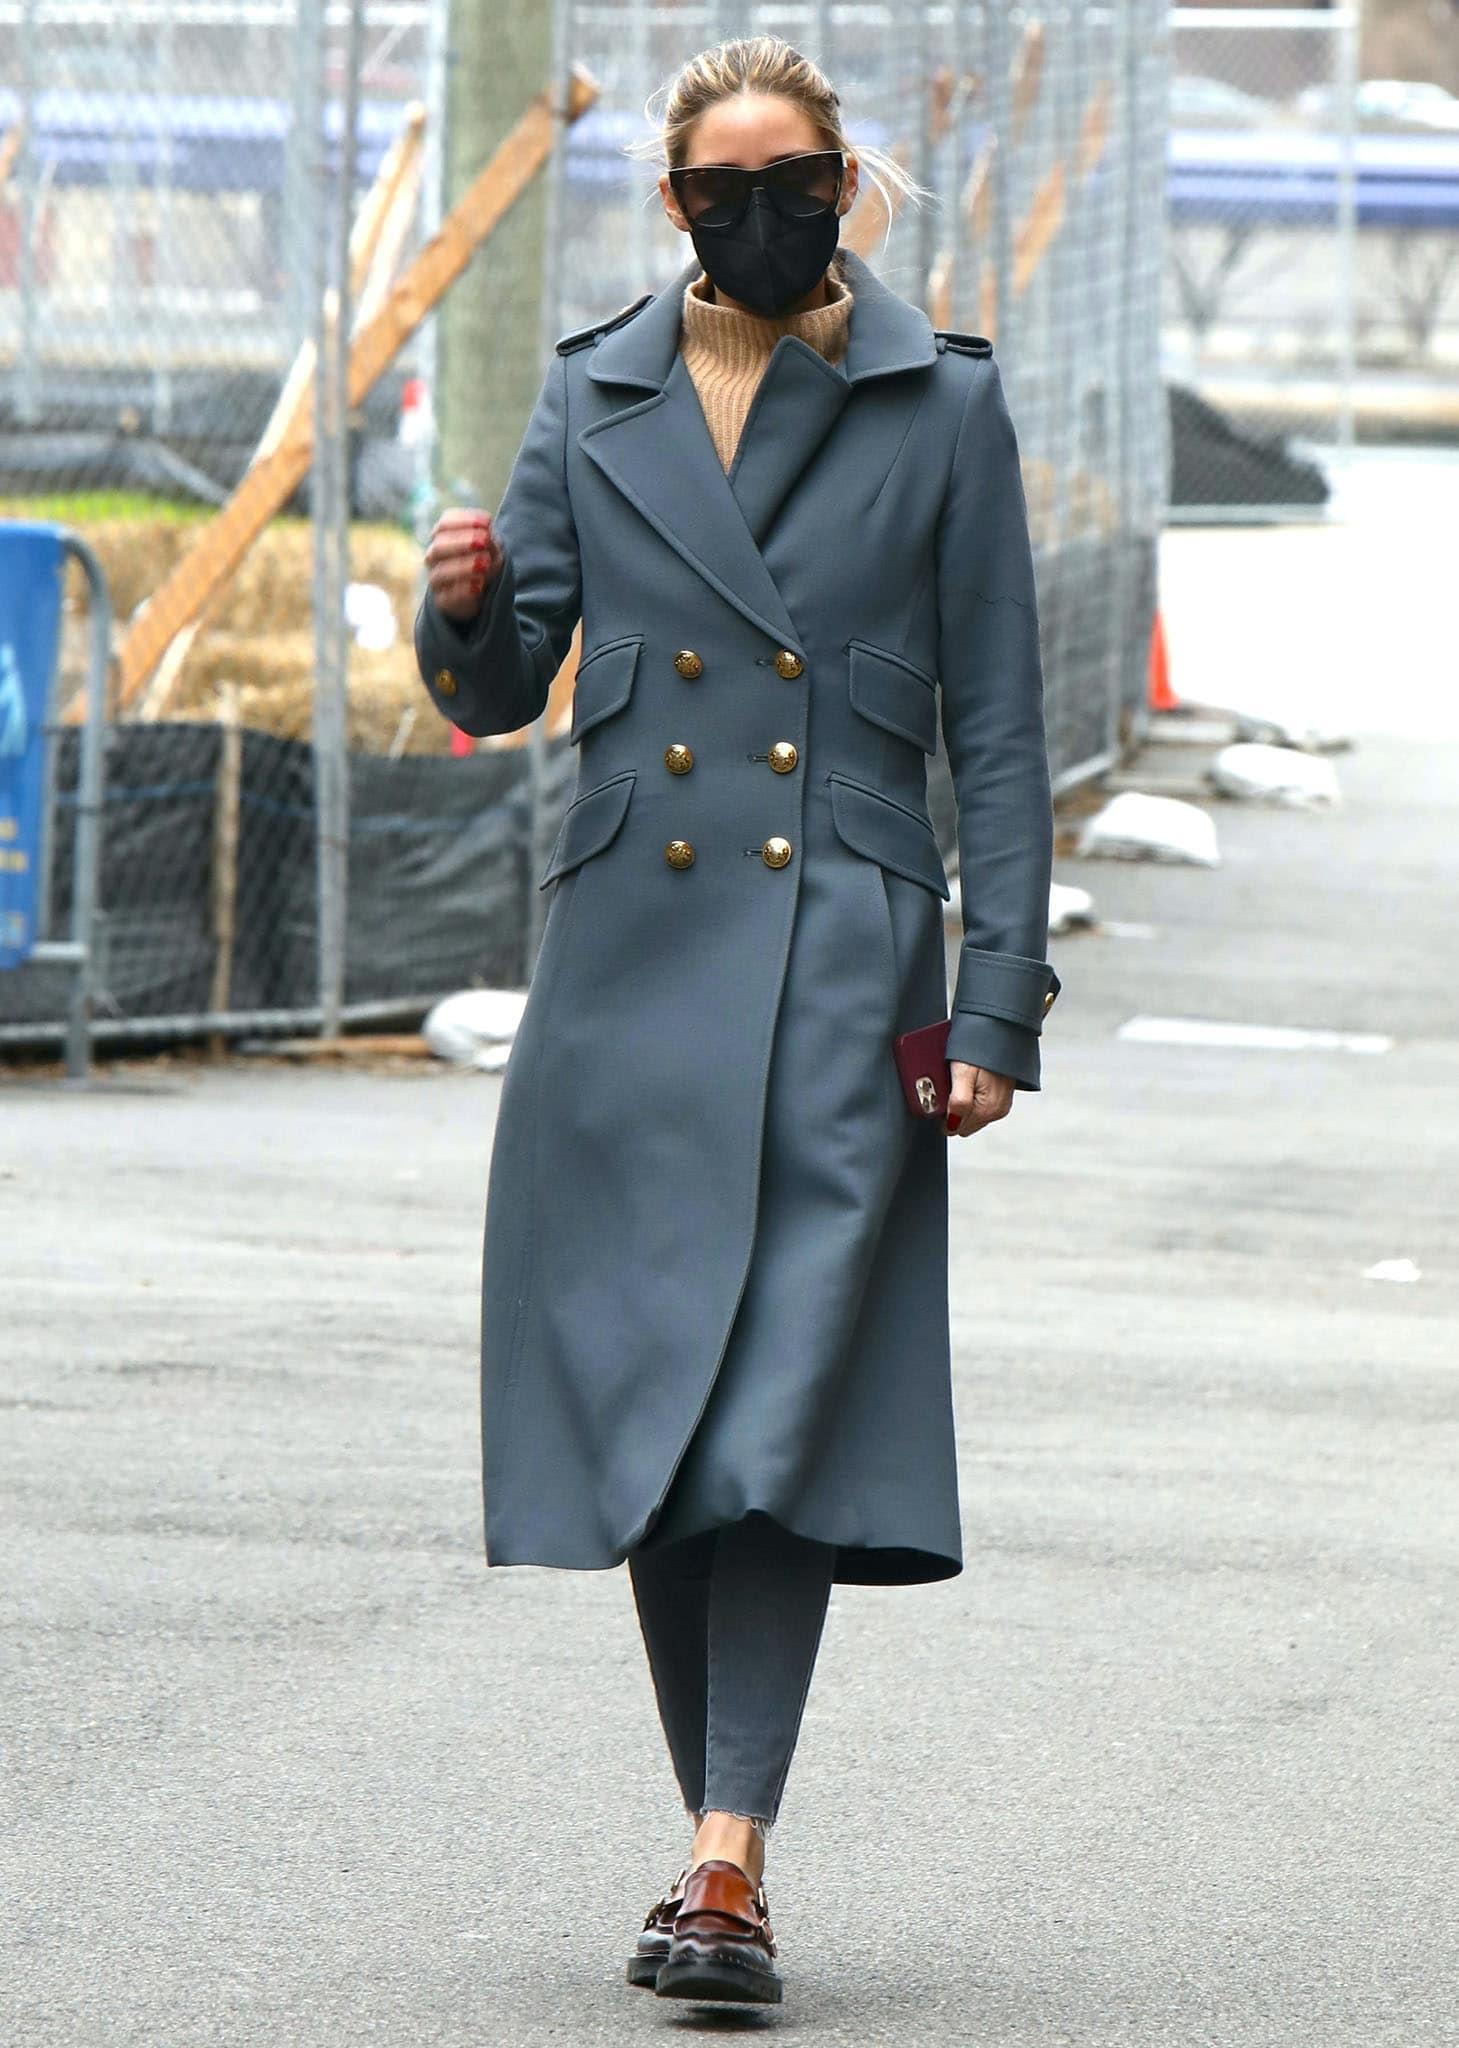 Olivia Palermo runs errands in luxurious Smythe Birkin coat and skinny jeans on April 4, 2021